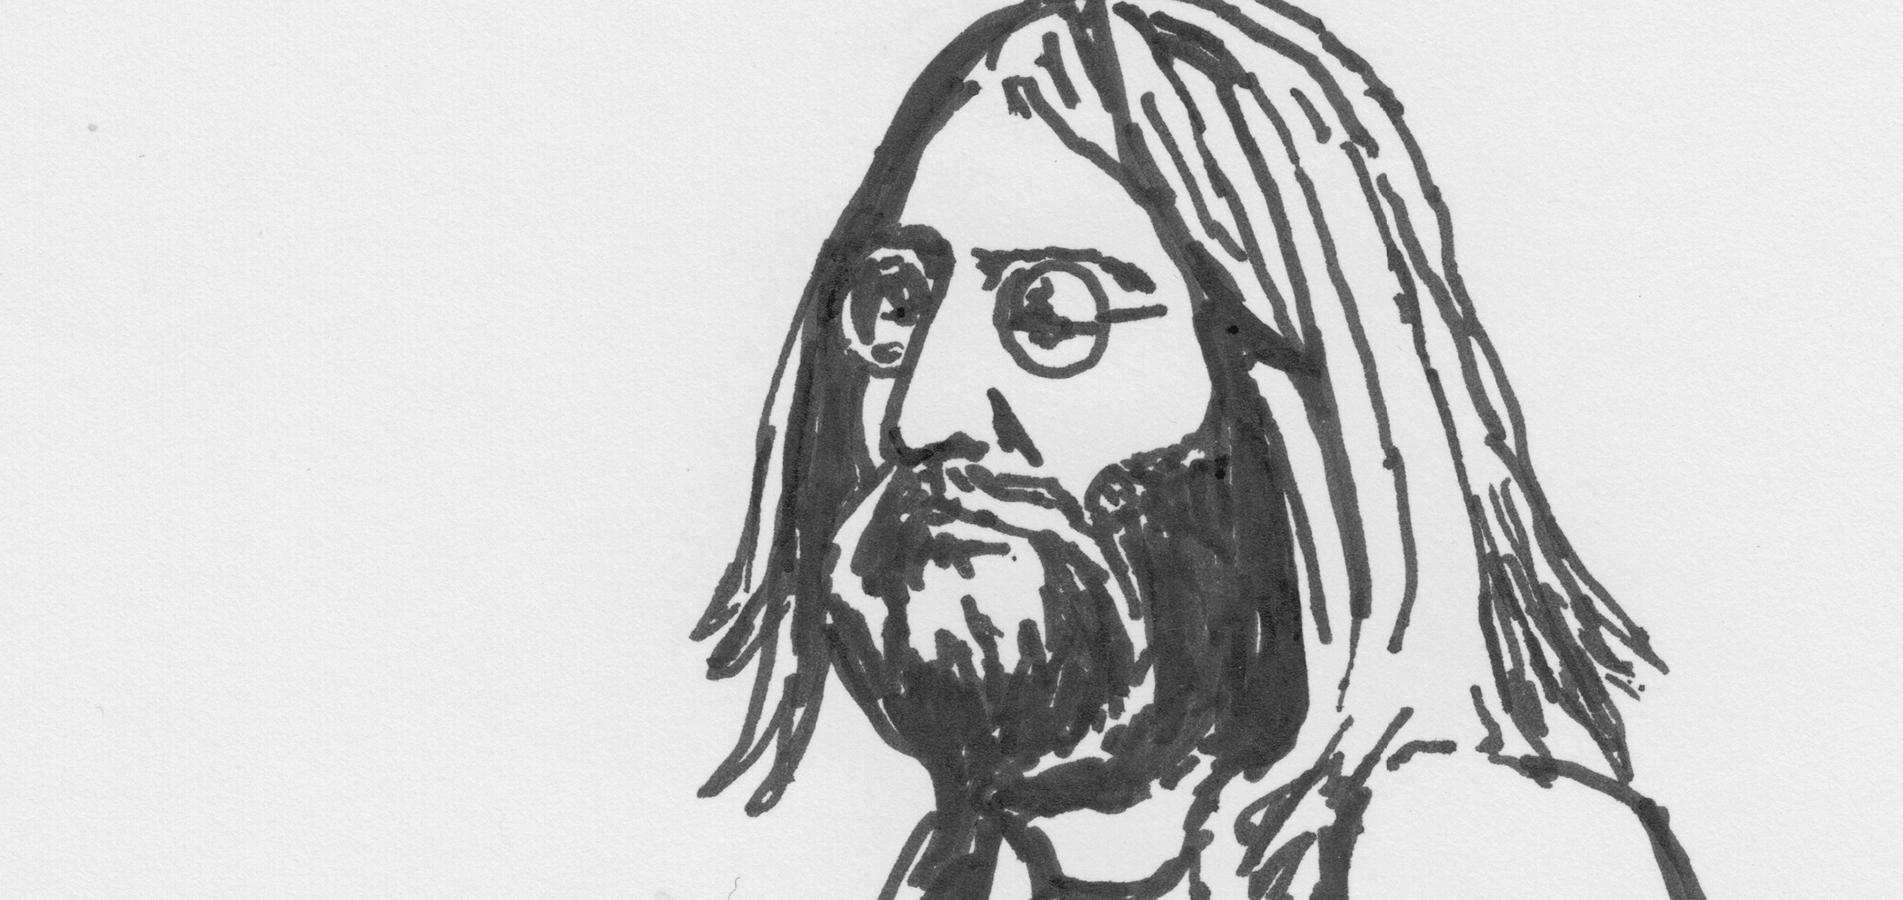 Drawing of John Lennon